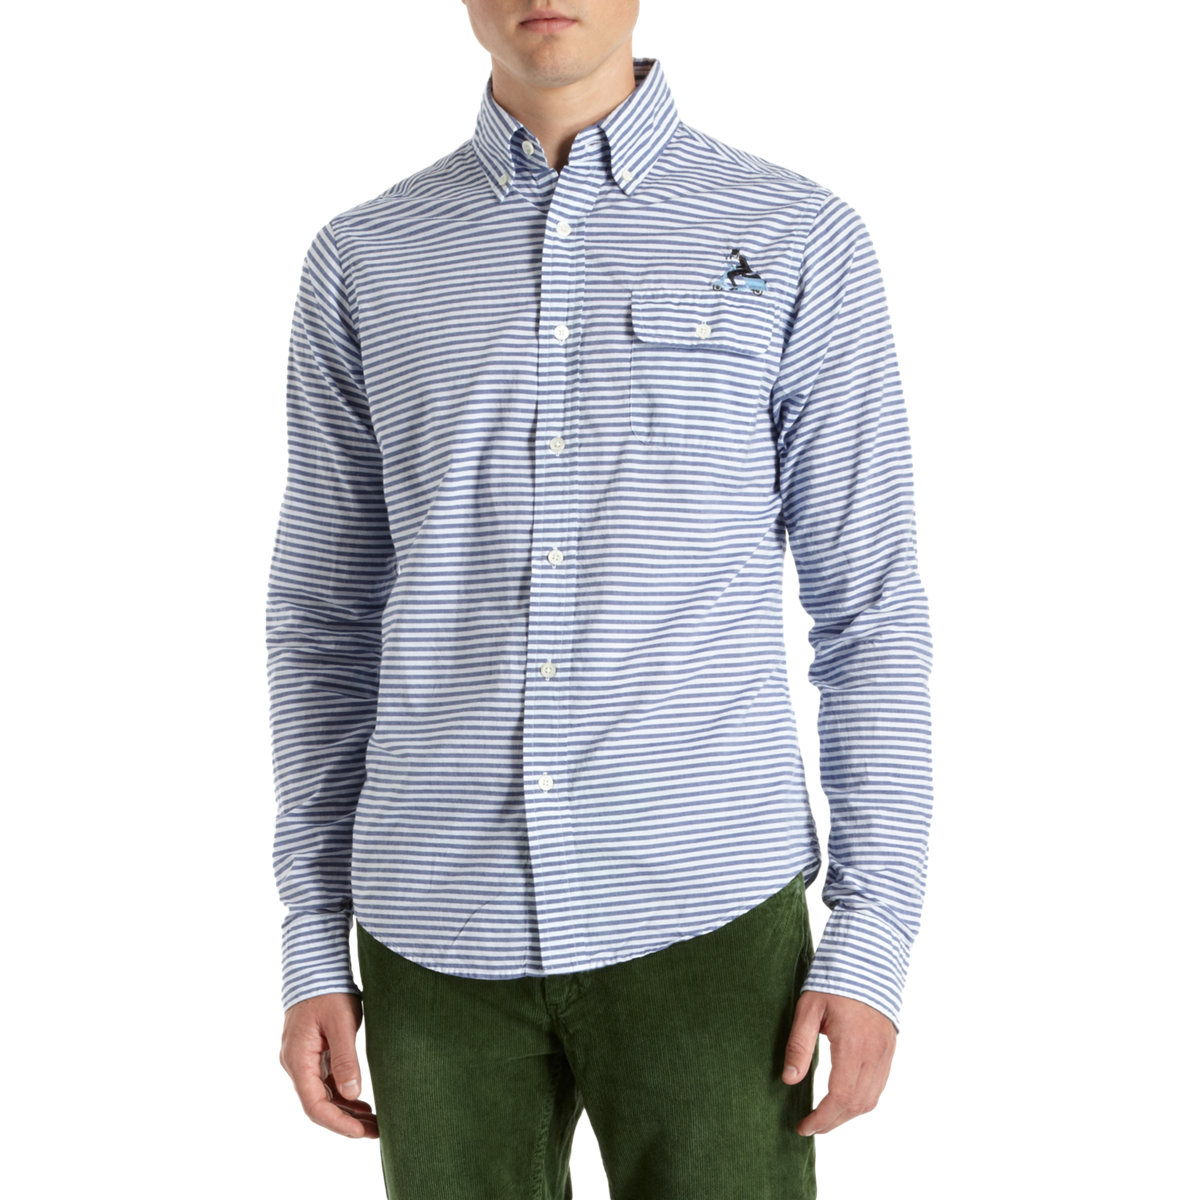 Gant by michael bastian horizontal striped shirt in white for Horizontal striped dress shirts men